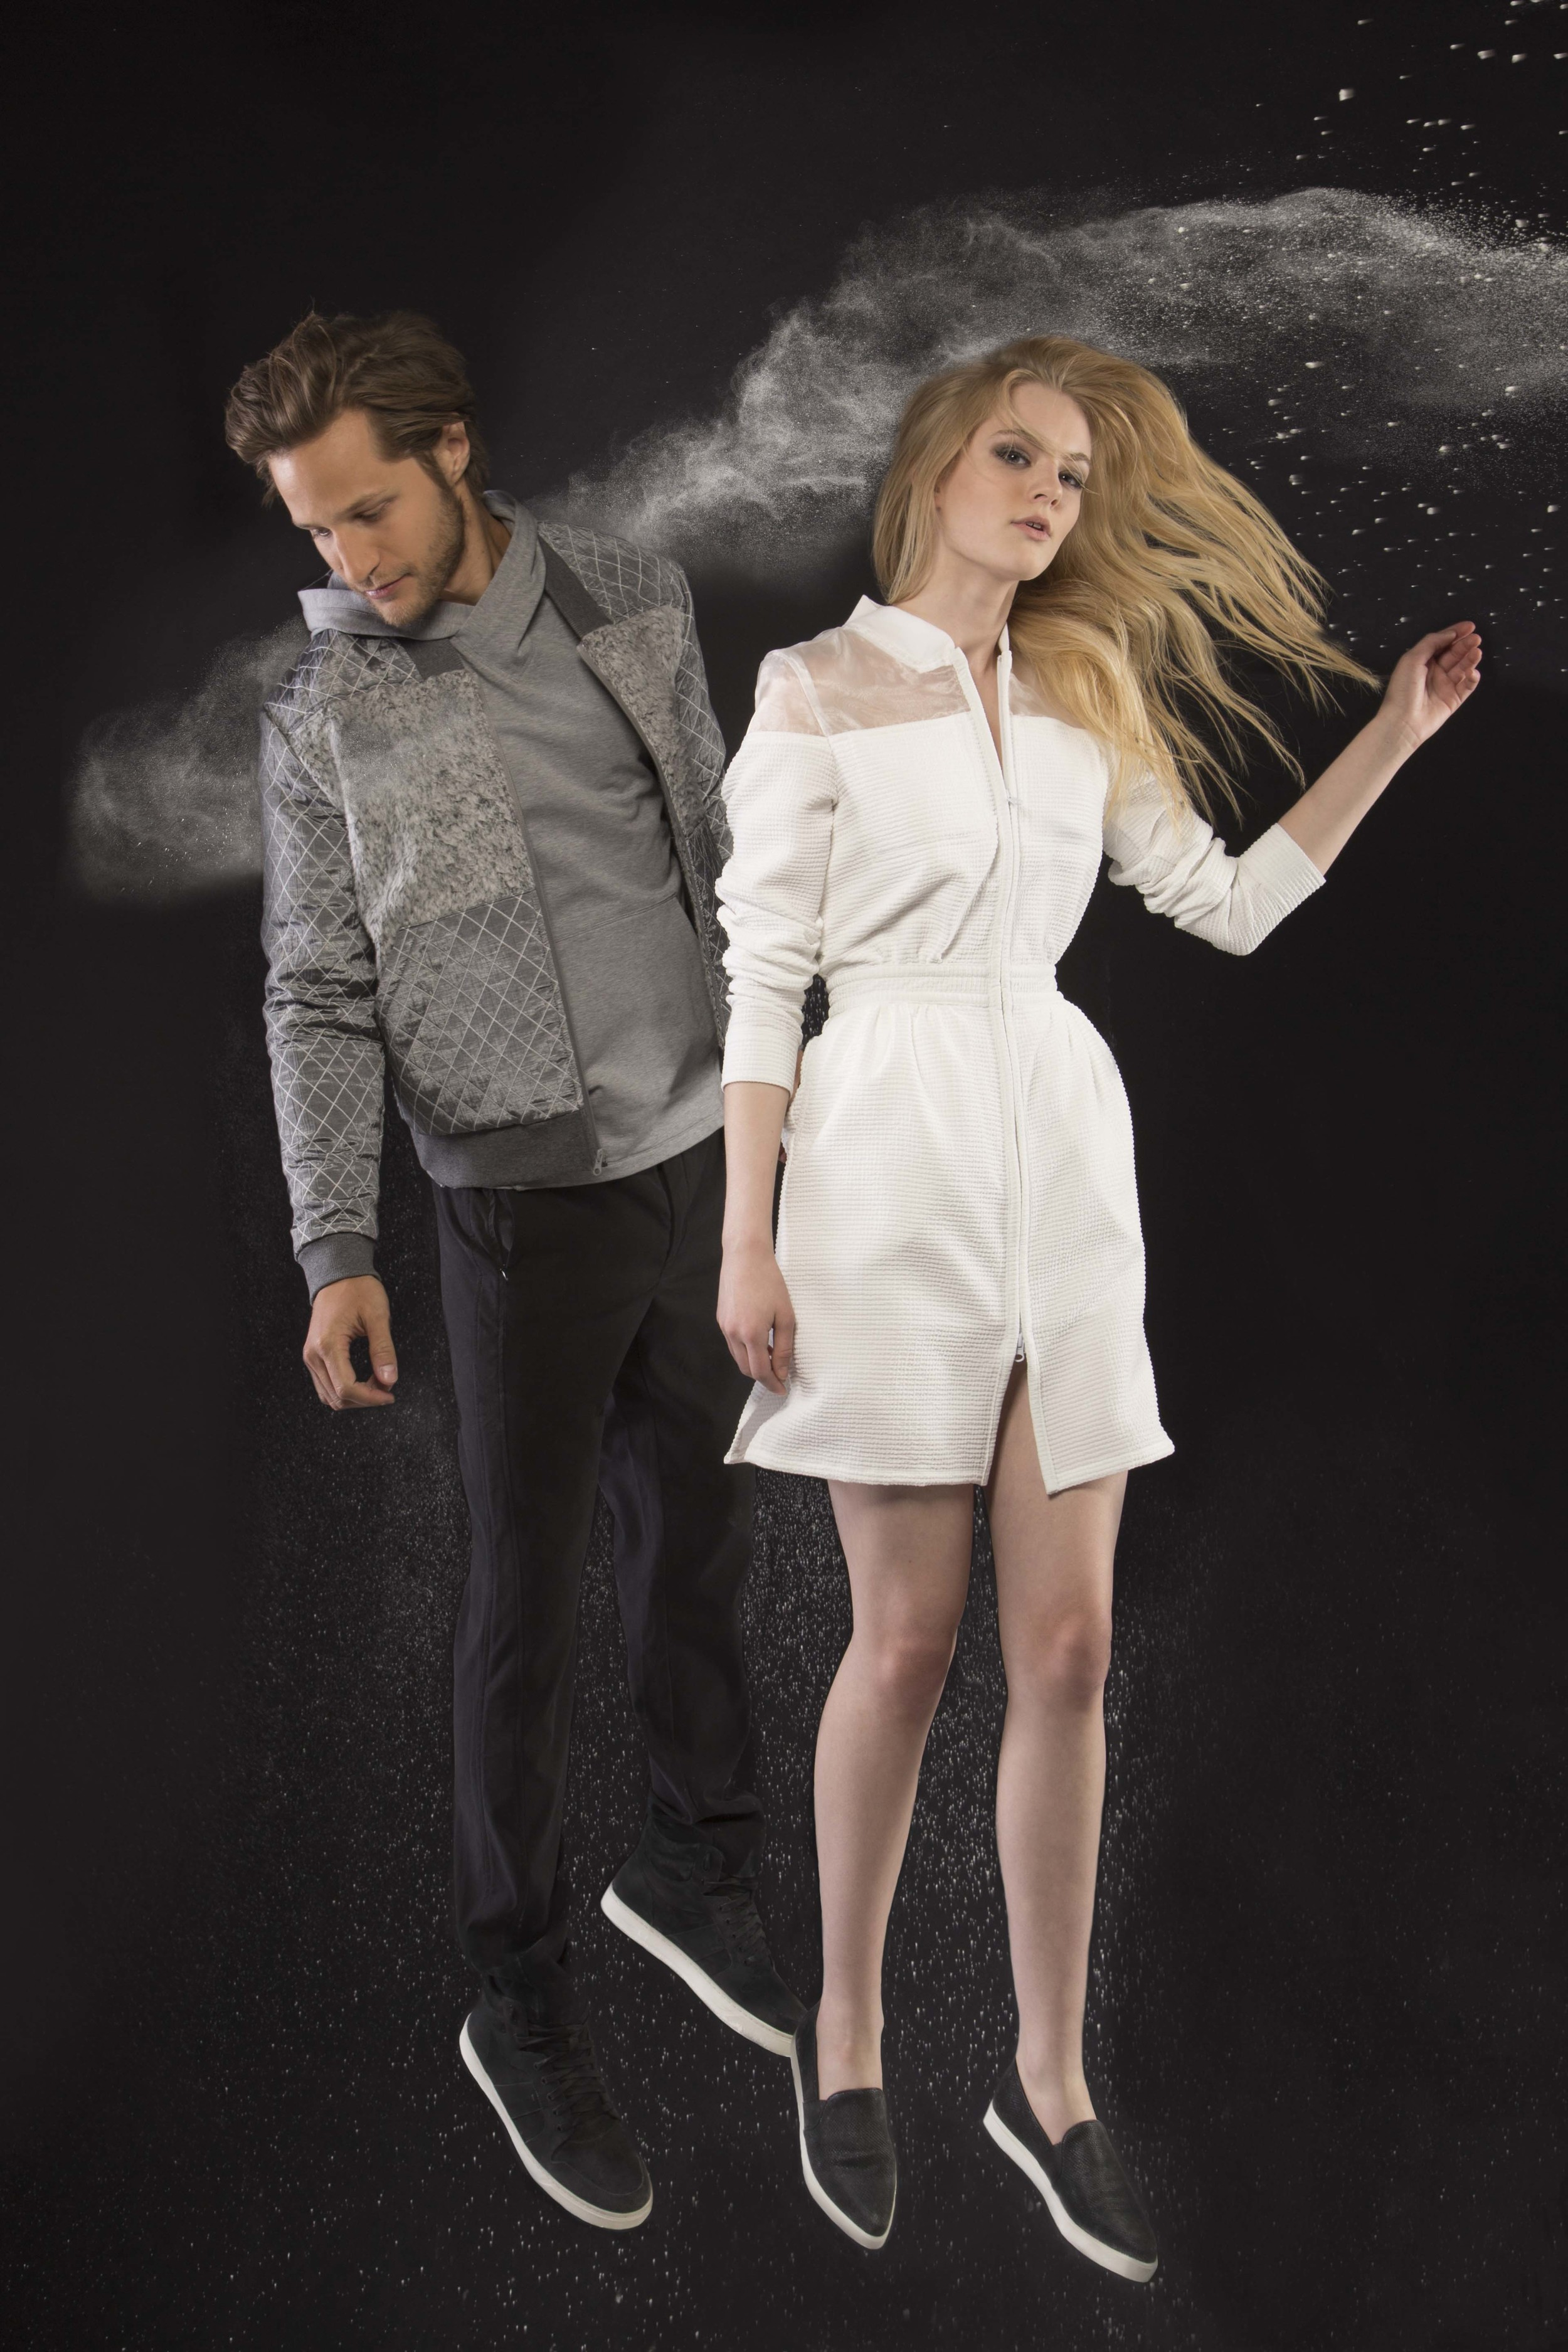 A Galaxy-Themed Fashion Shoot